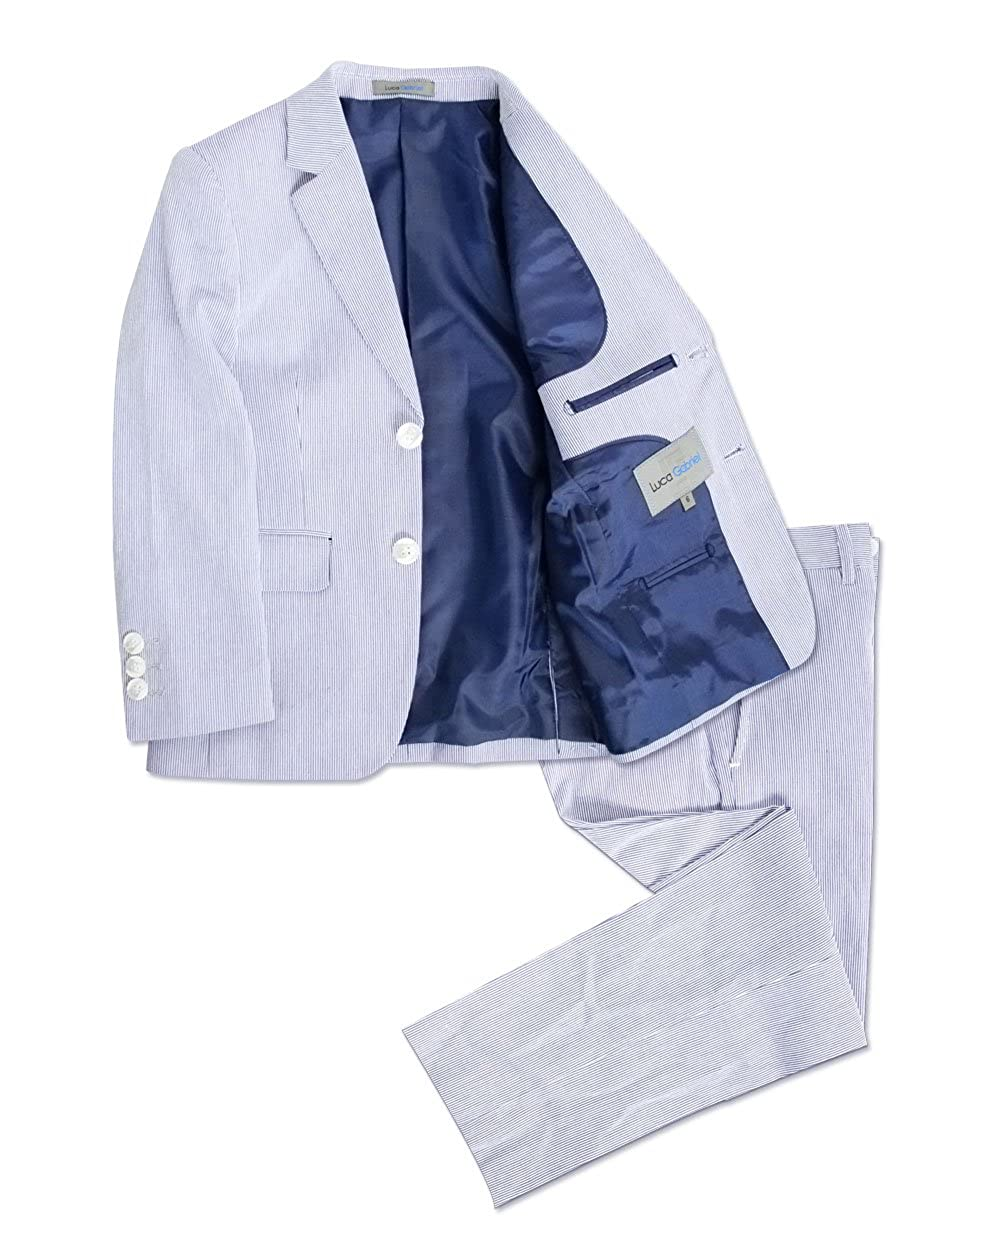 Luca Gabriel Toddler Boys' 2 Piece English Semi Formal Casual Grey Plaid Coat Blazer and Pant Set